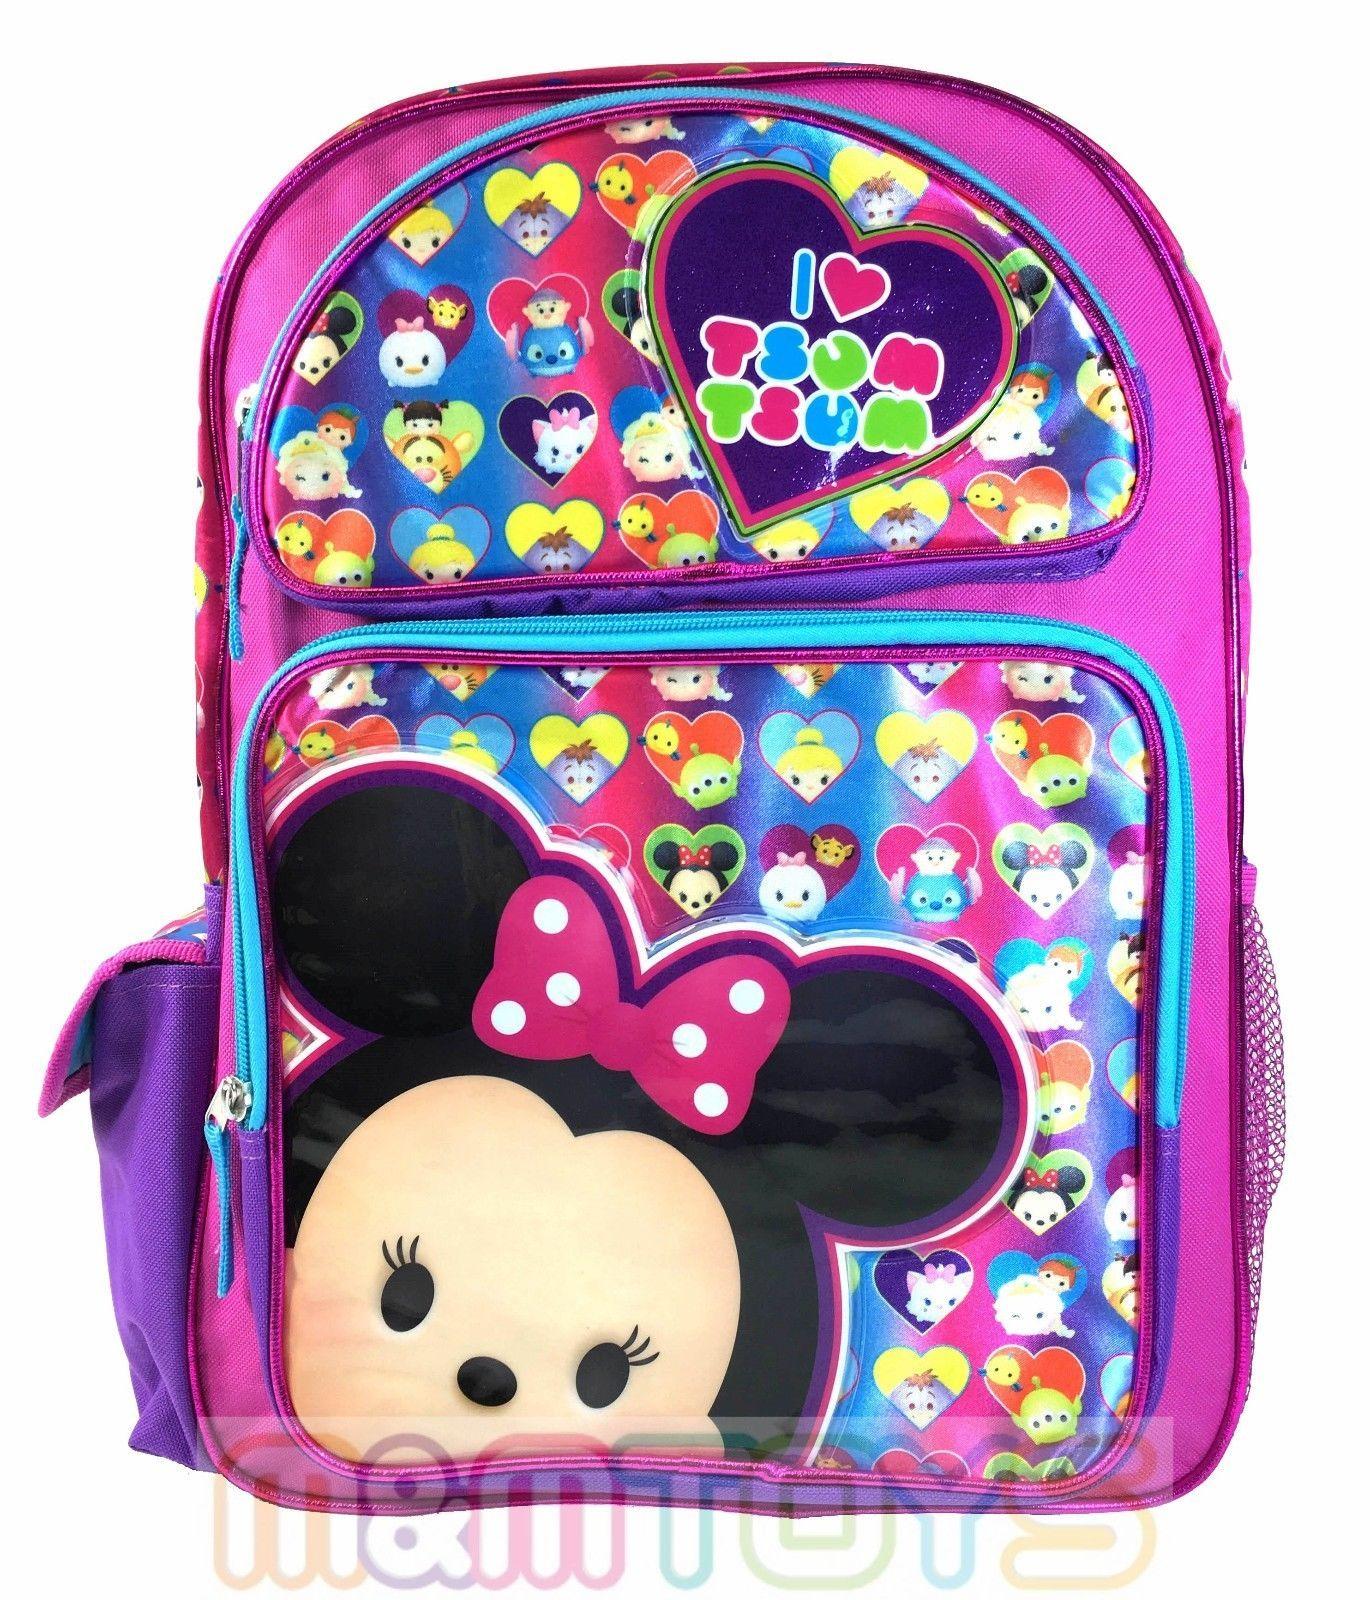 35eaf31689 Disney Tsum Tsum Minnie Mouse 16